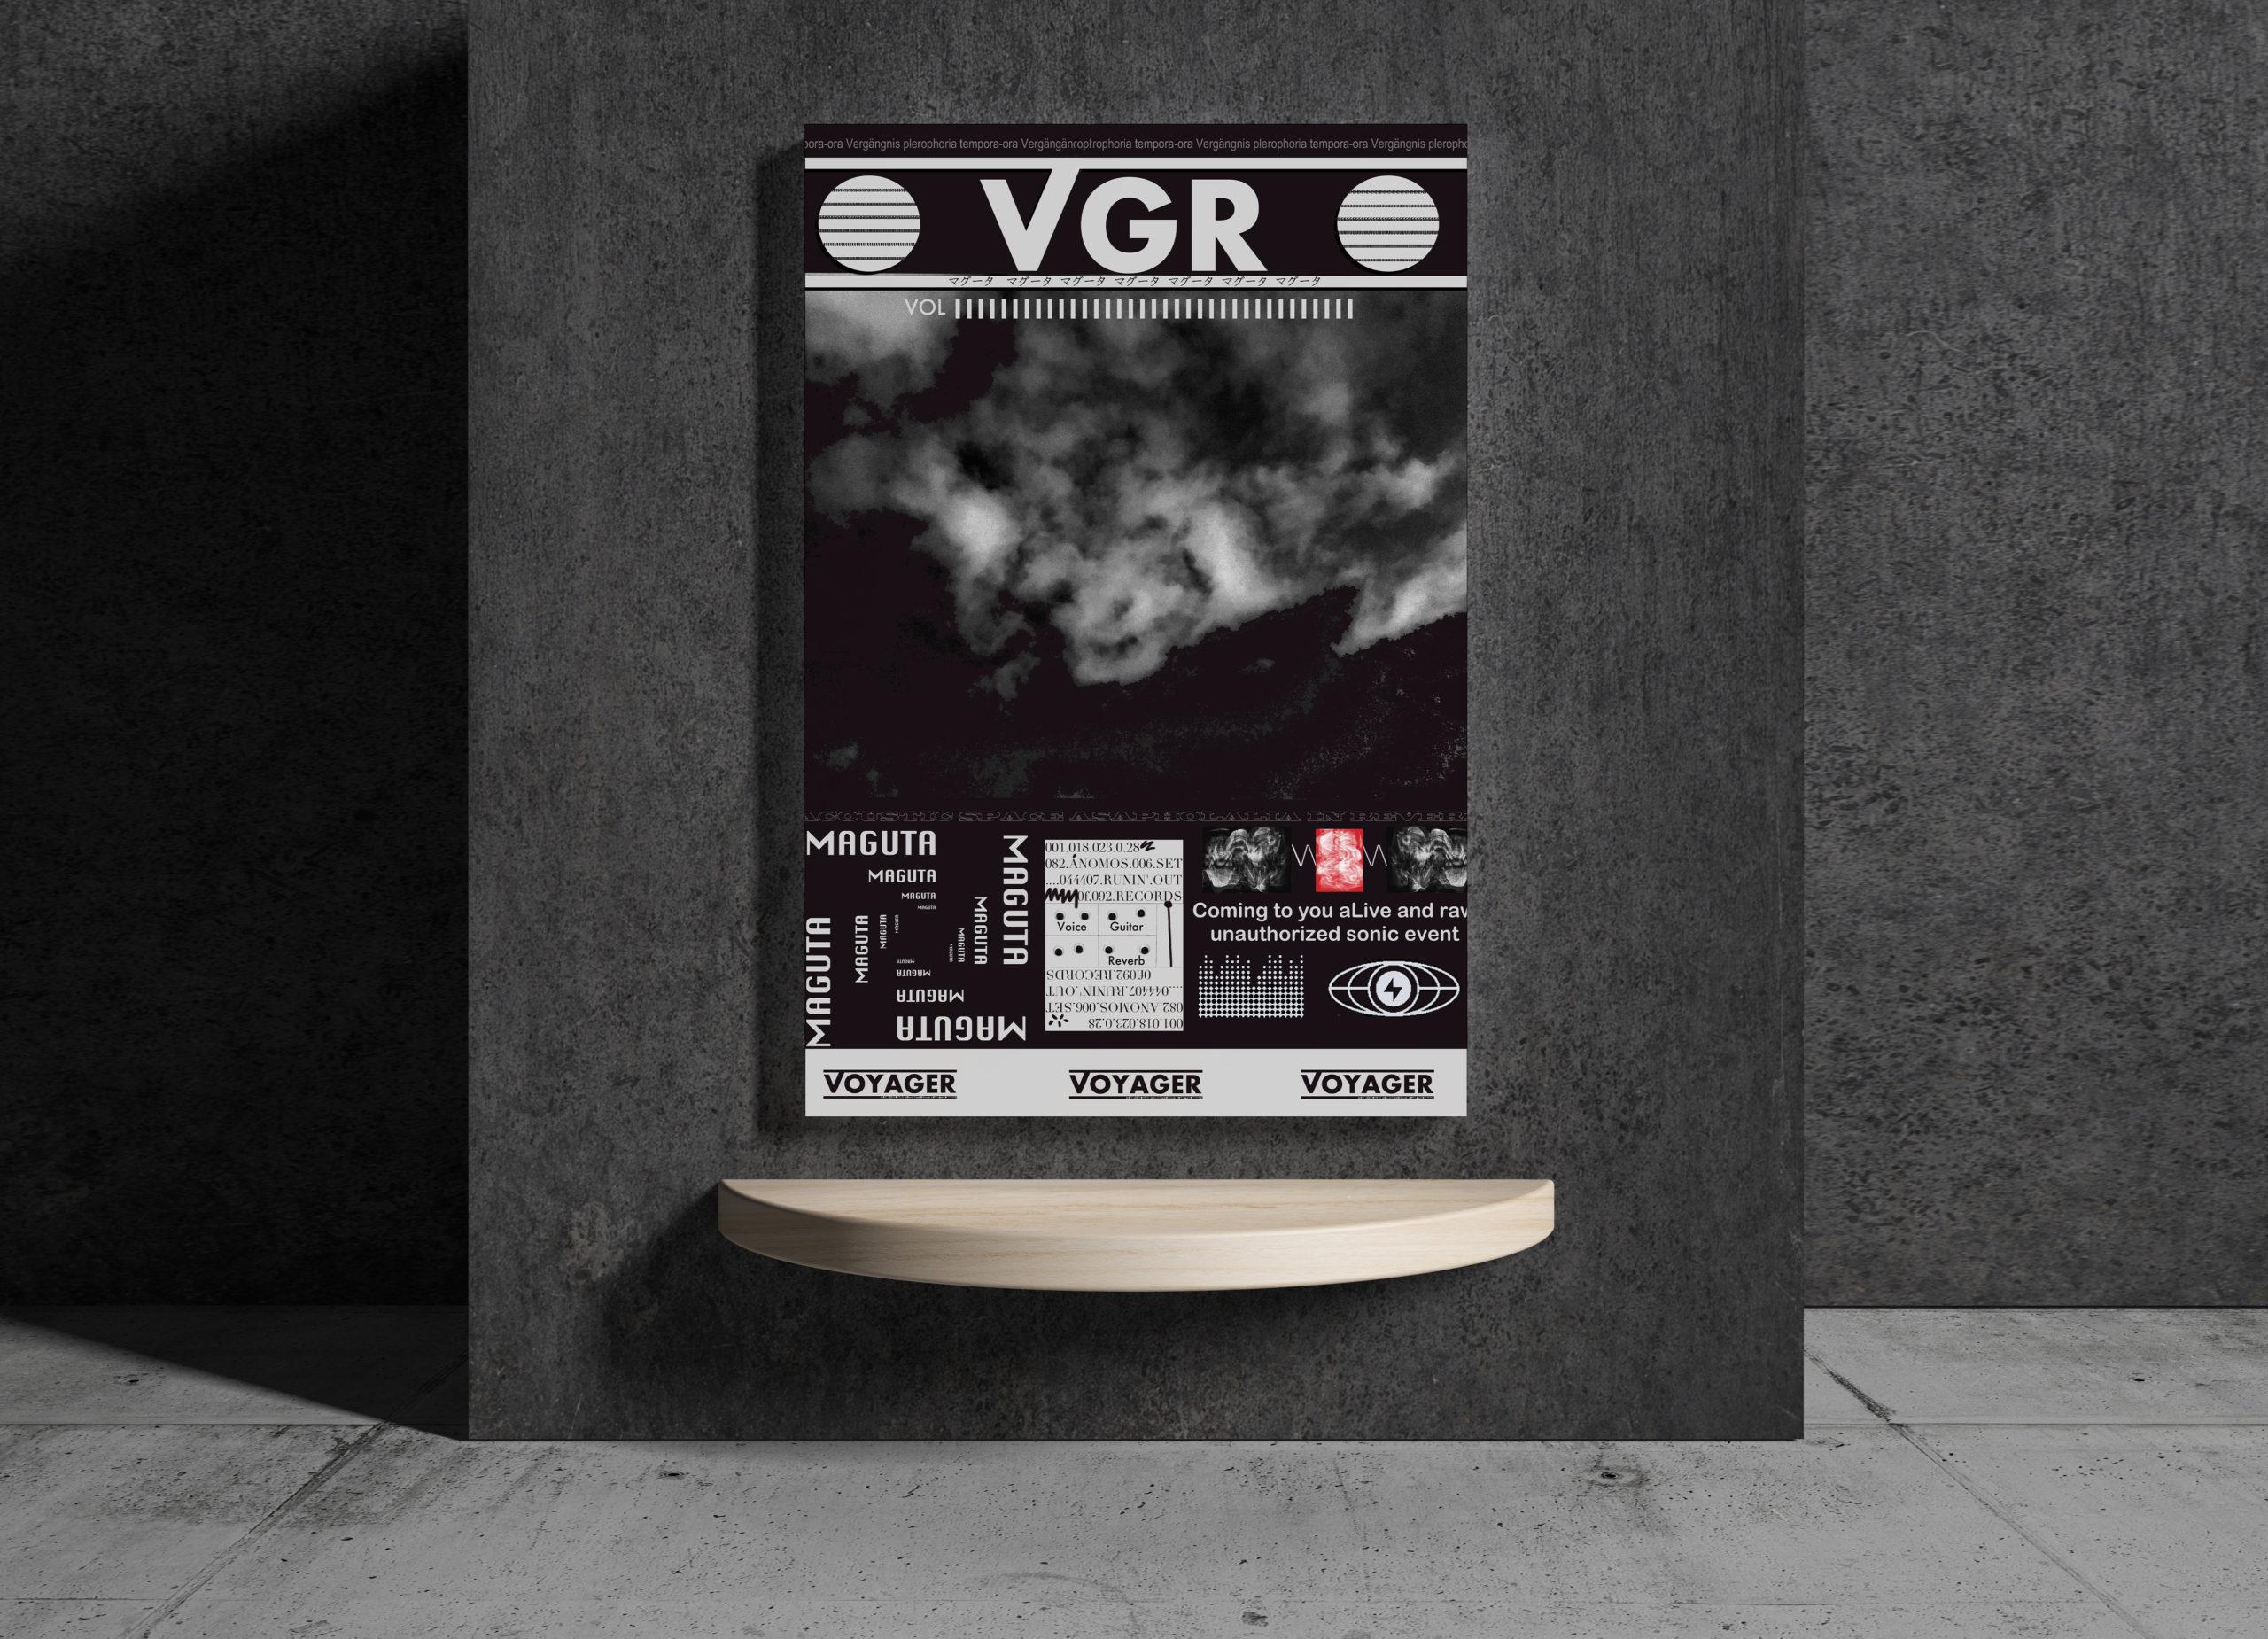 VGR on Steam TV